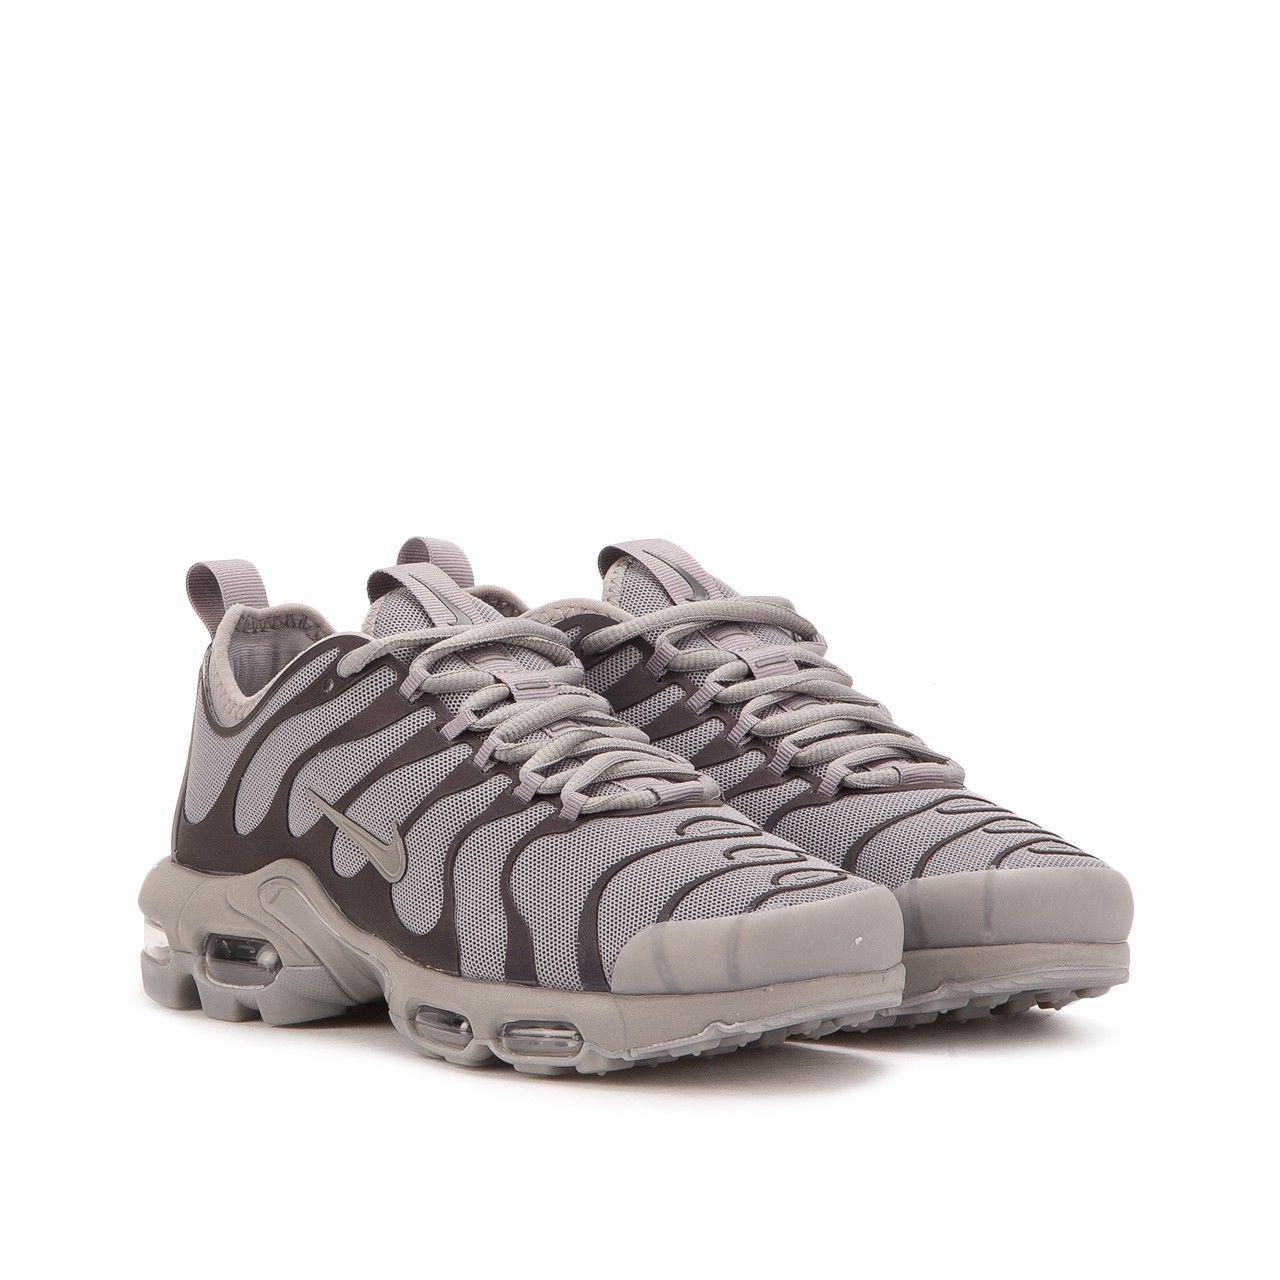 Nike WMNS Air Max Plus TN Ultra (Grau) | Footwear in 2019